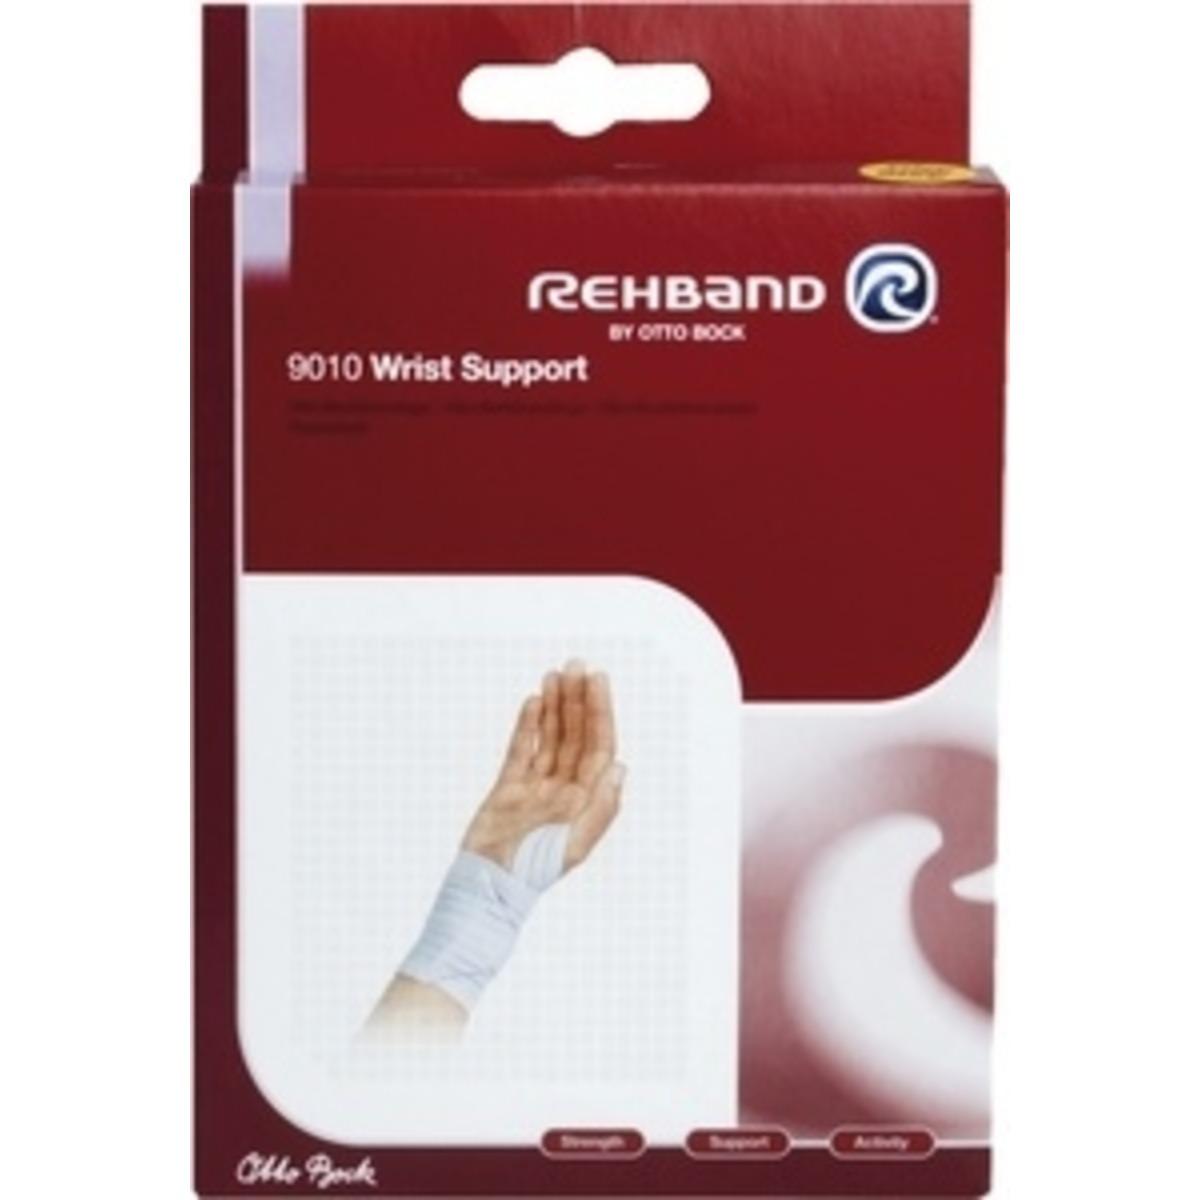 Rehband Handledsbandage - Blå - 1 Stk.